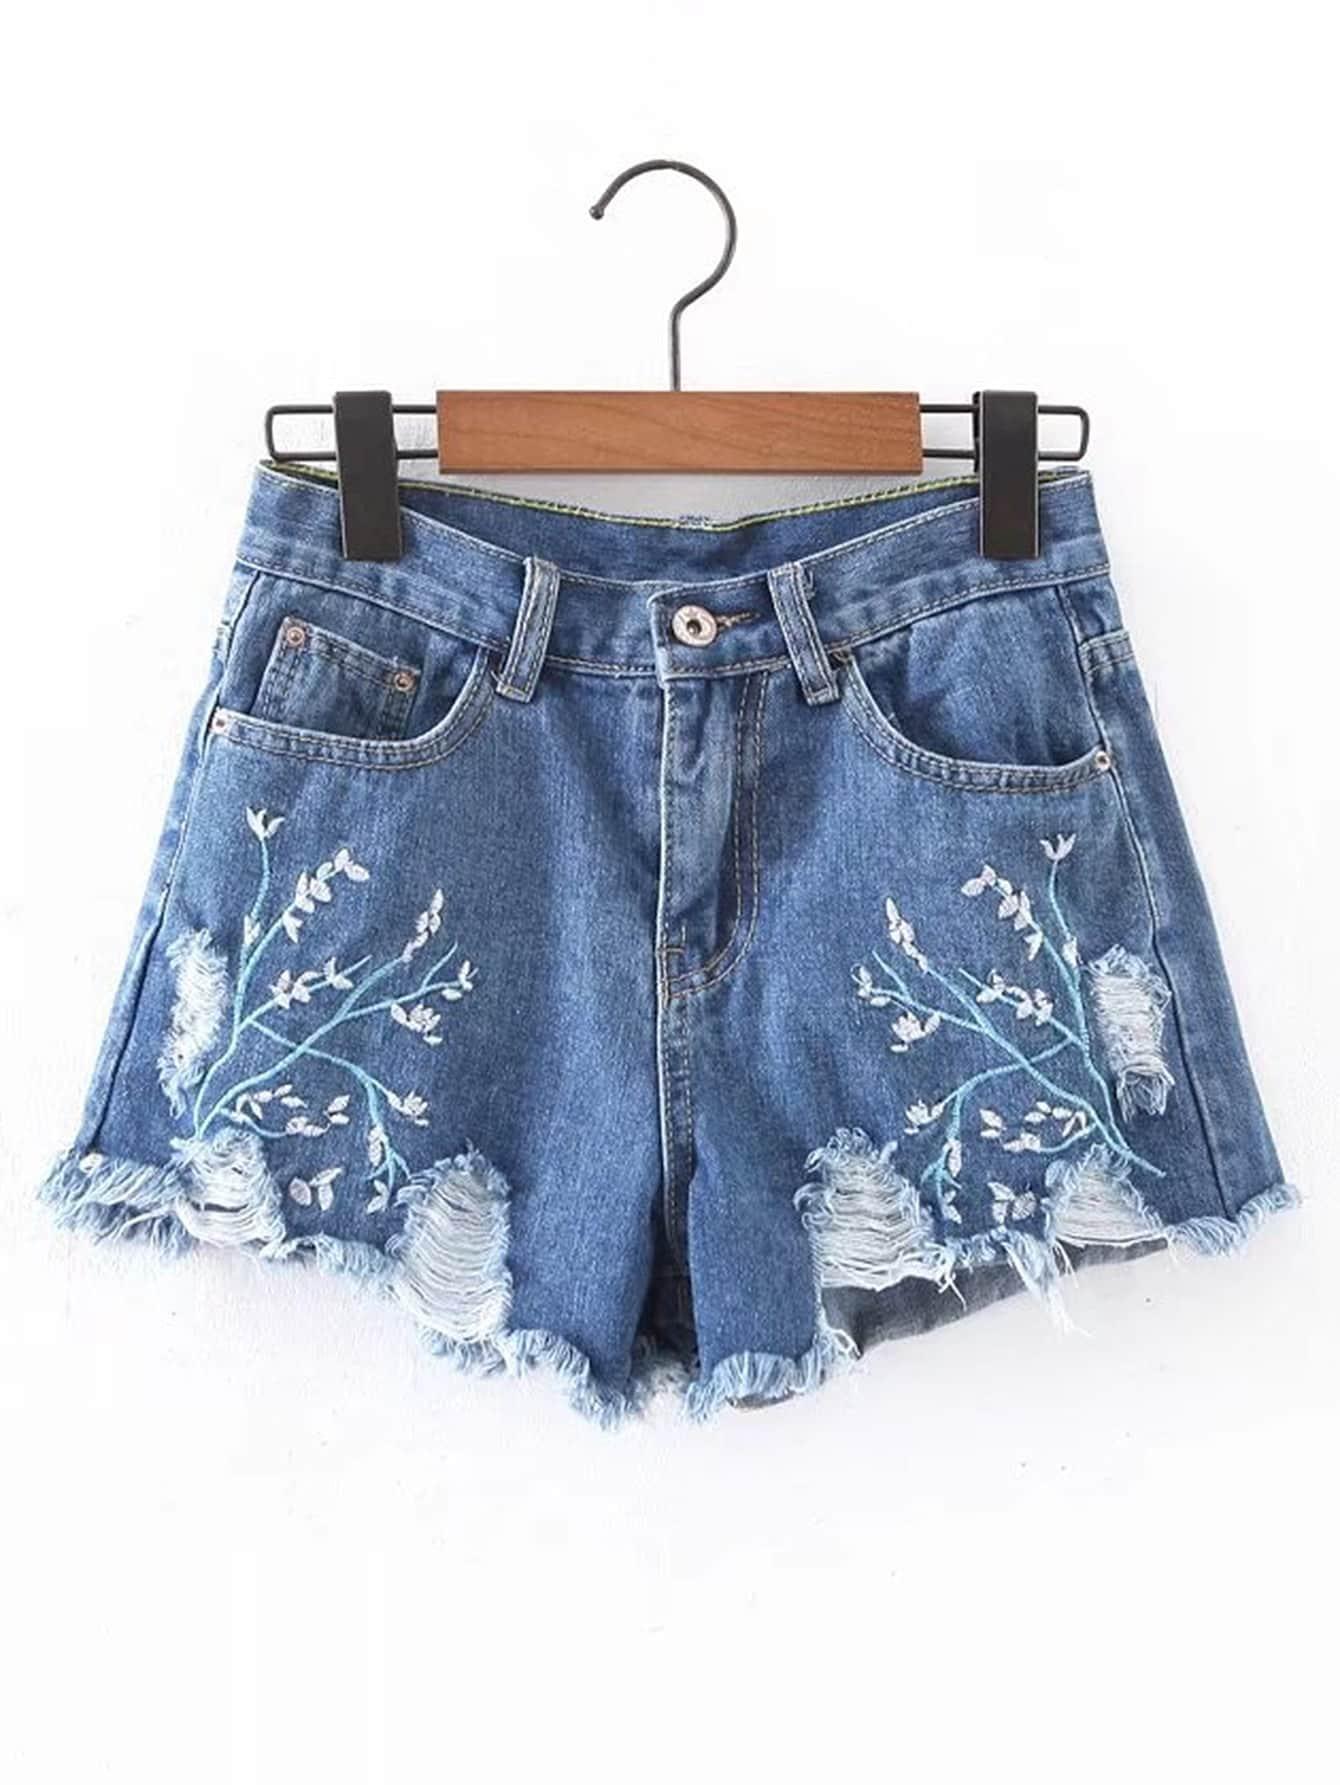 Фото Ripped Detail Embroidery Denim Shorts. Купить с доставкой